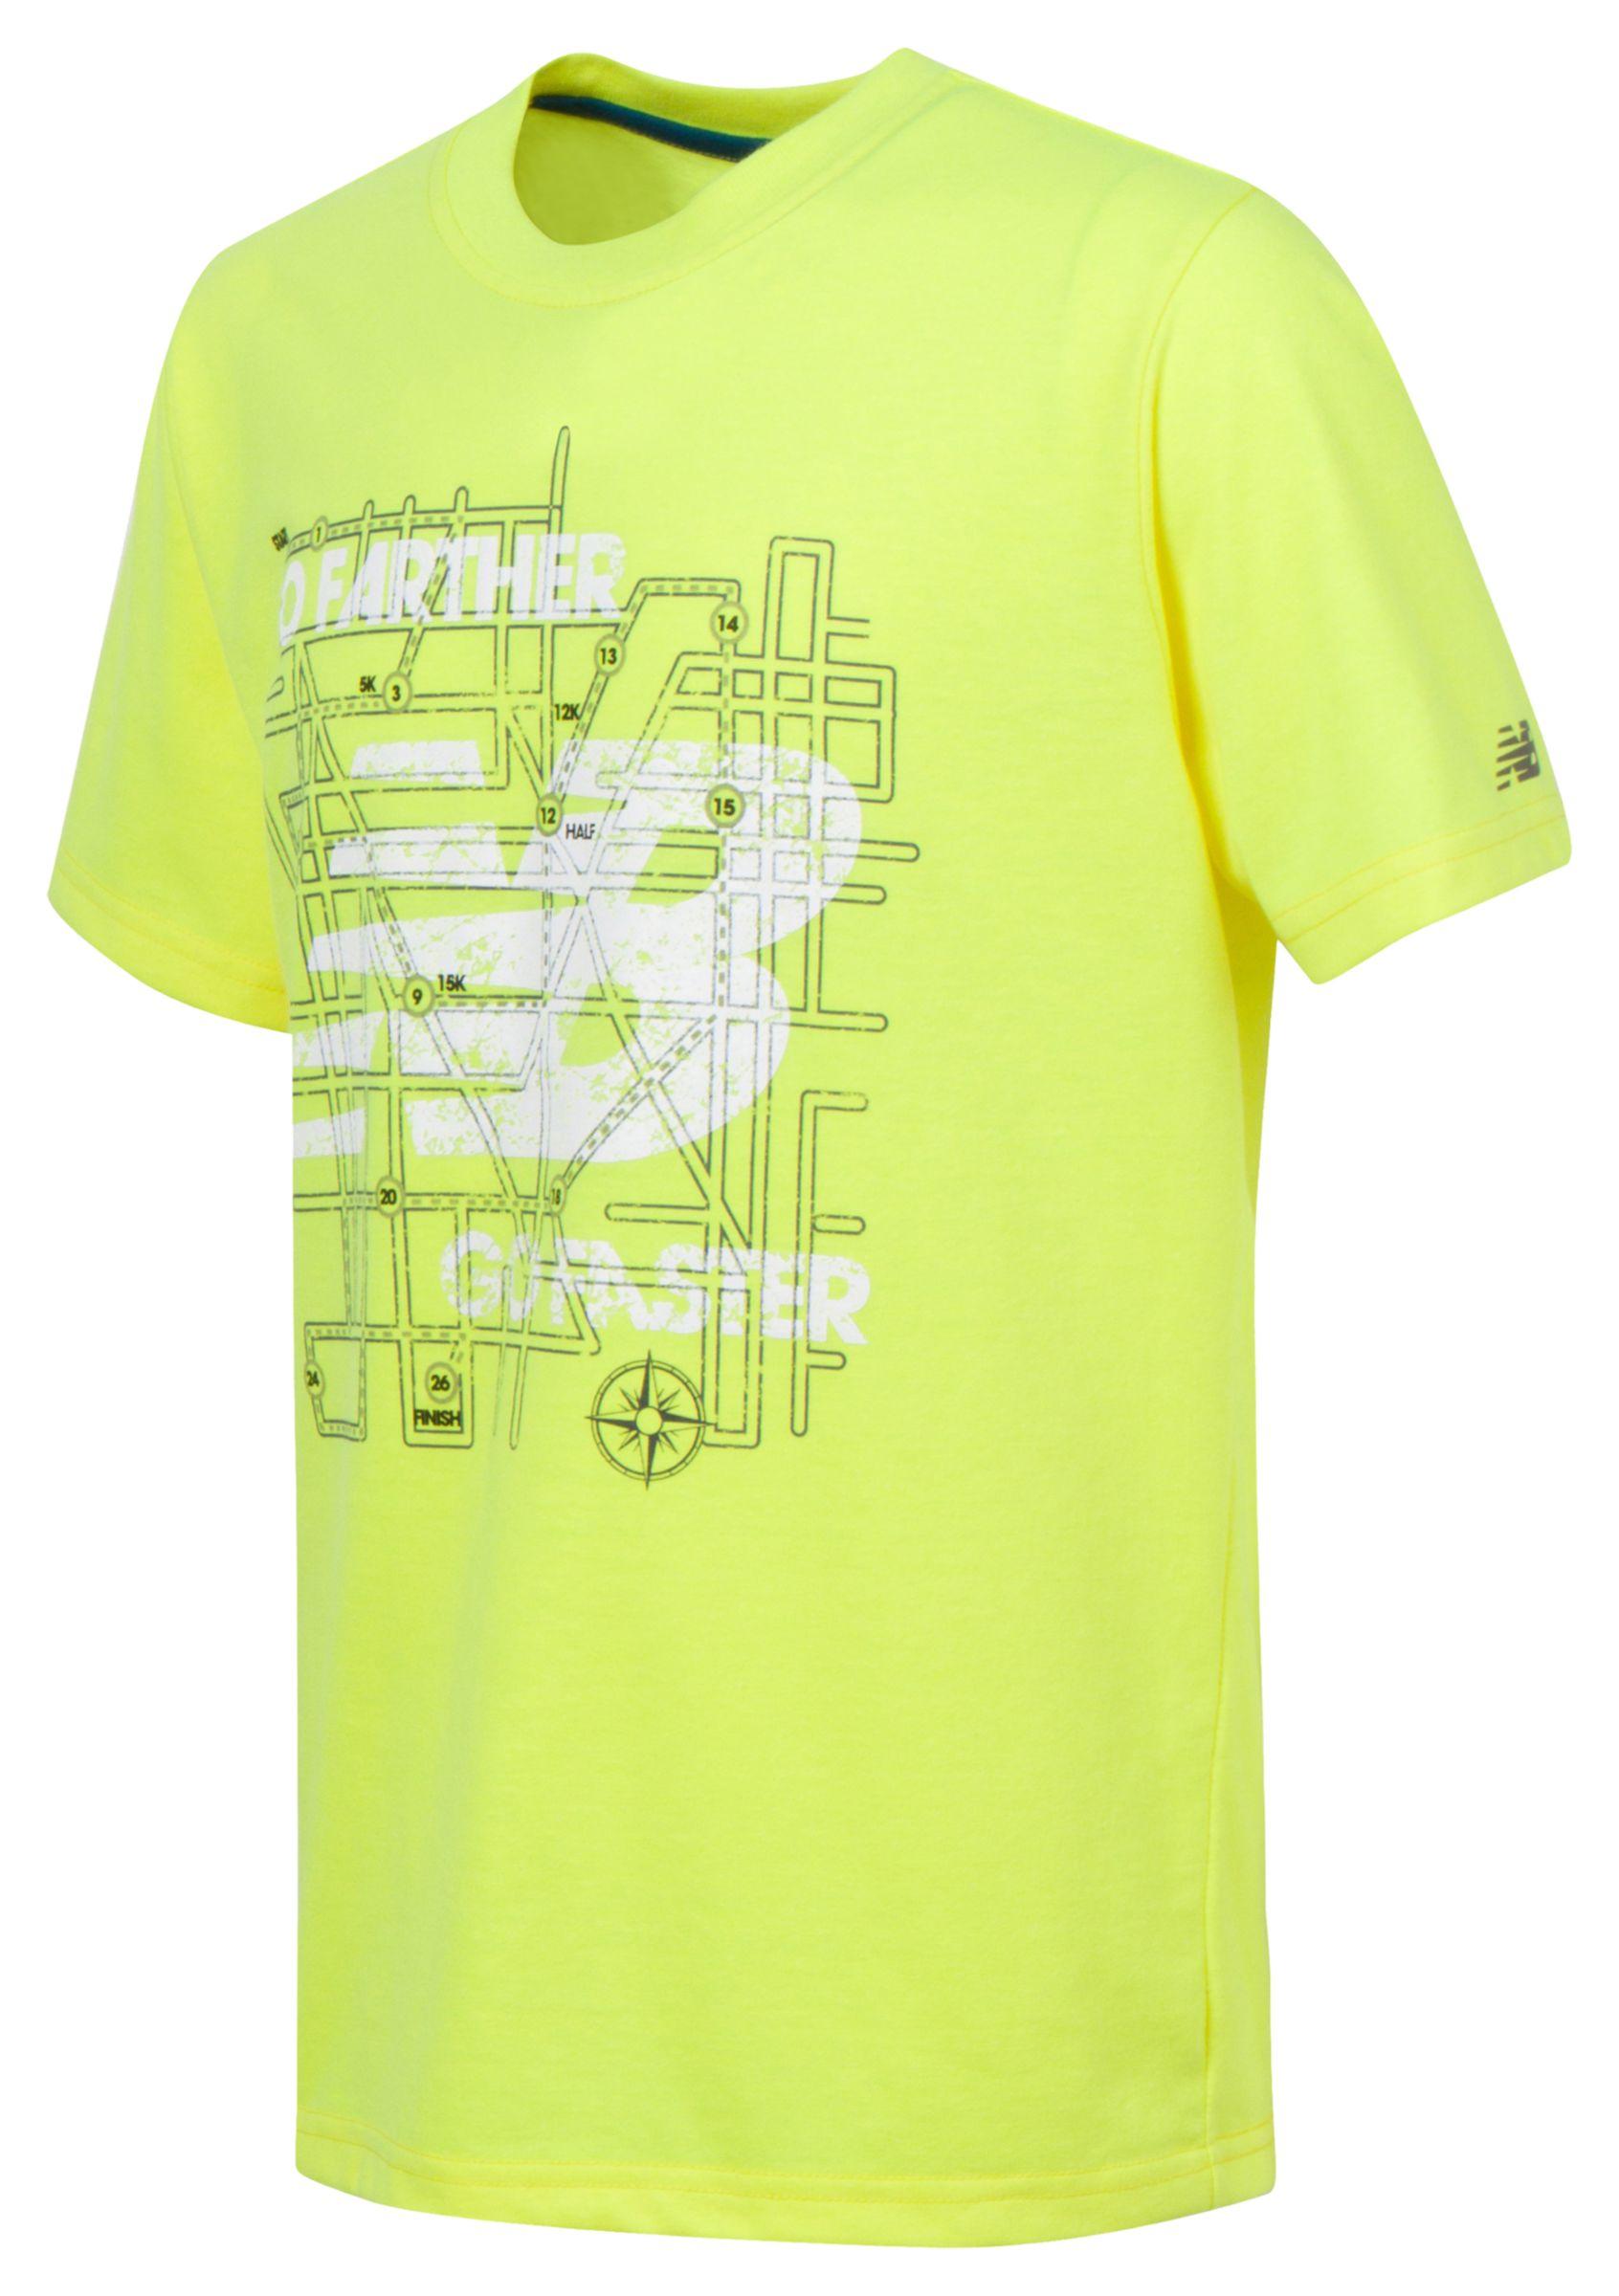 New Balance Boys Short Sleeve Graphic Tee Yellow